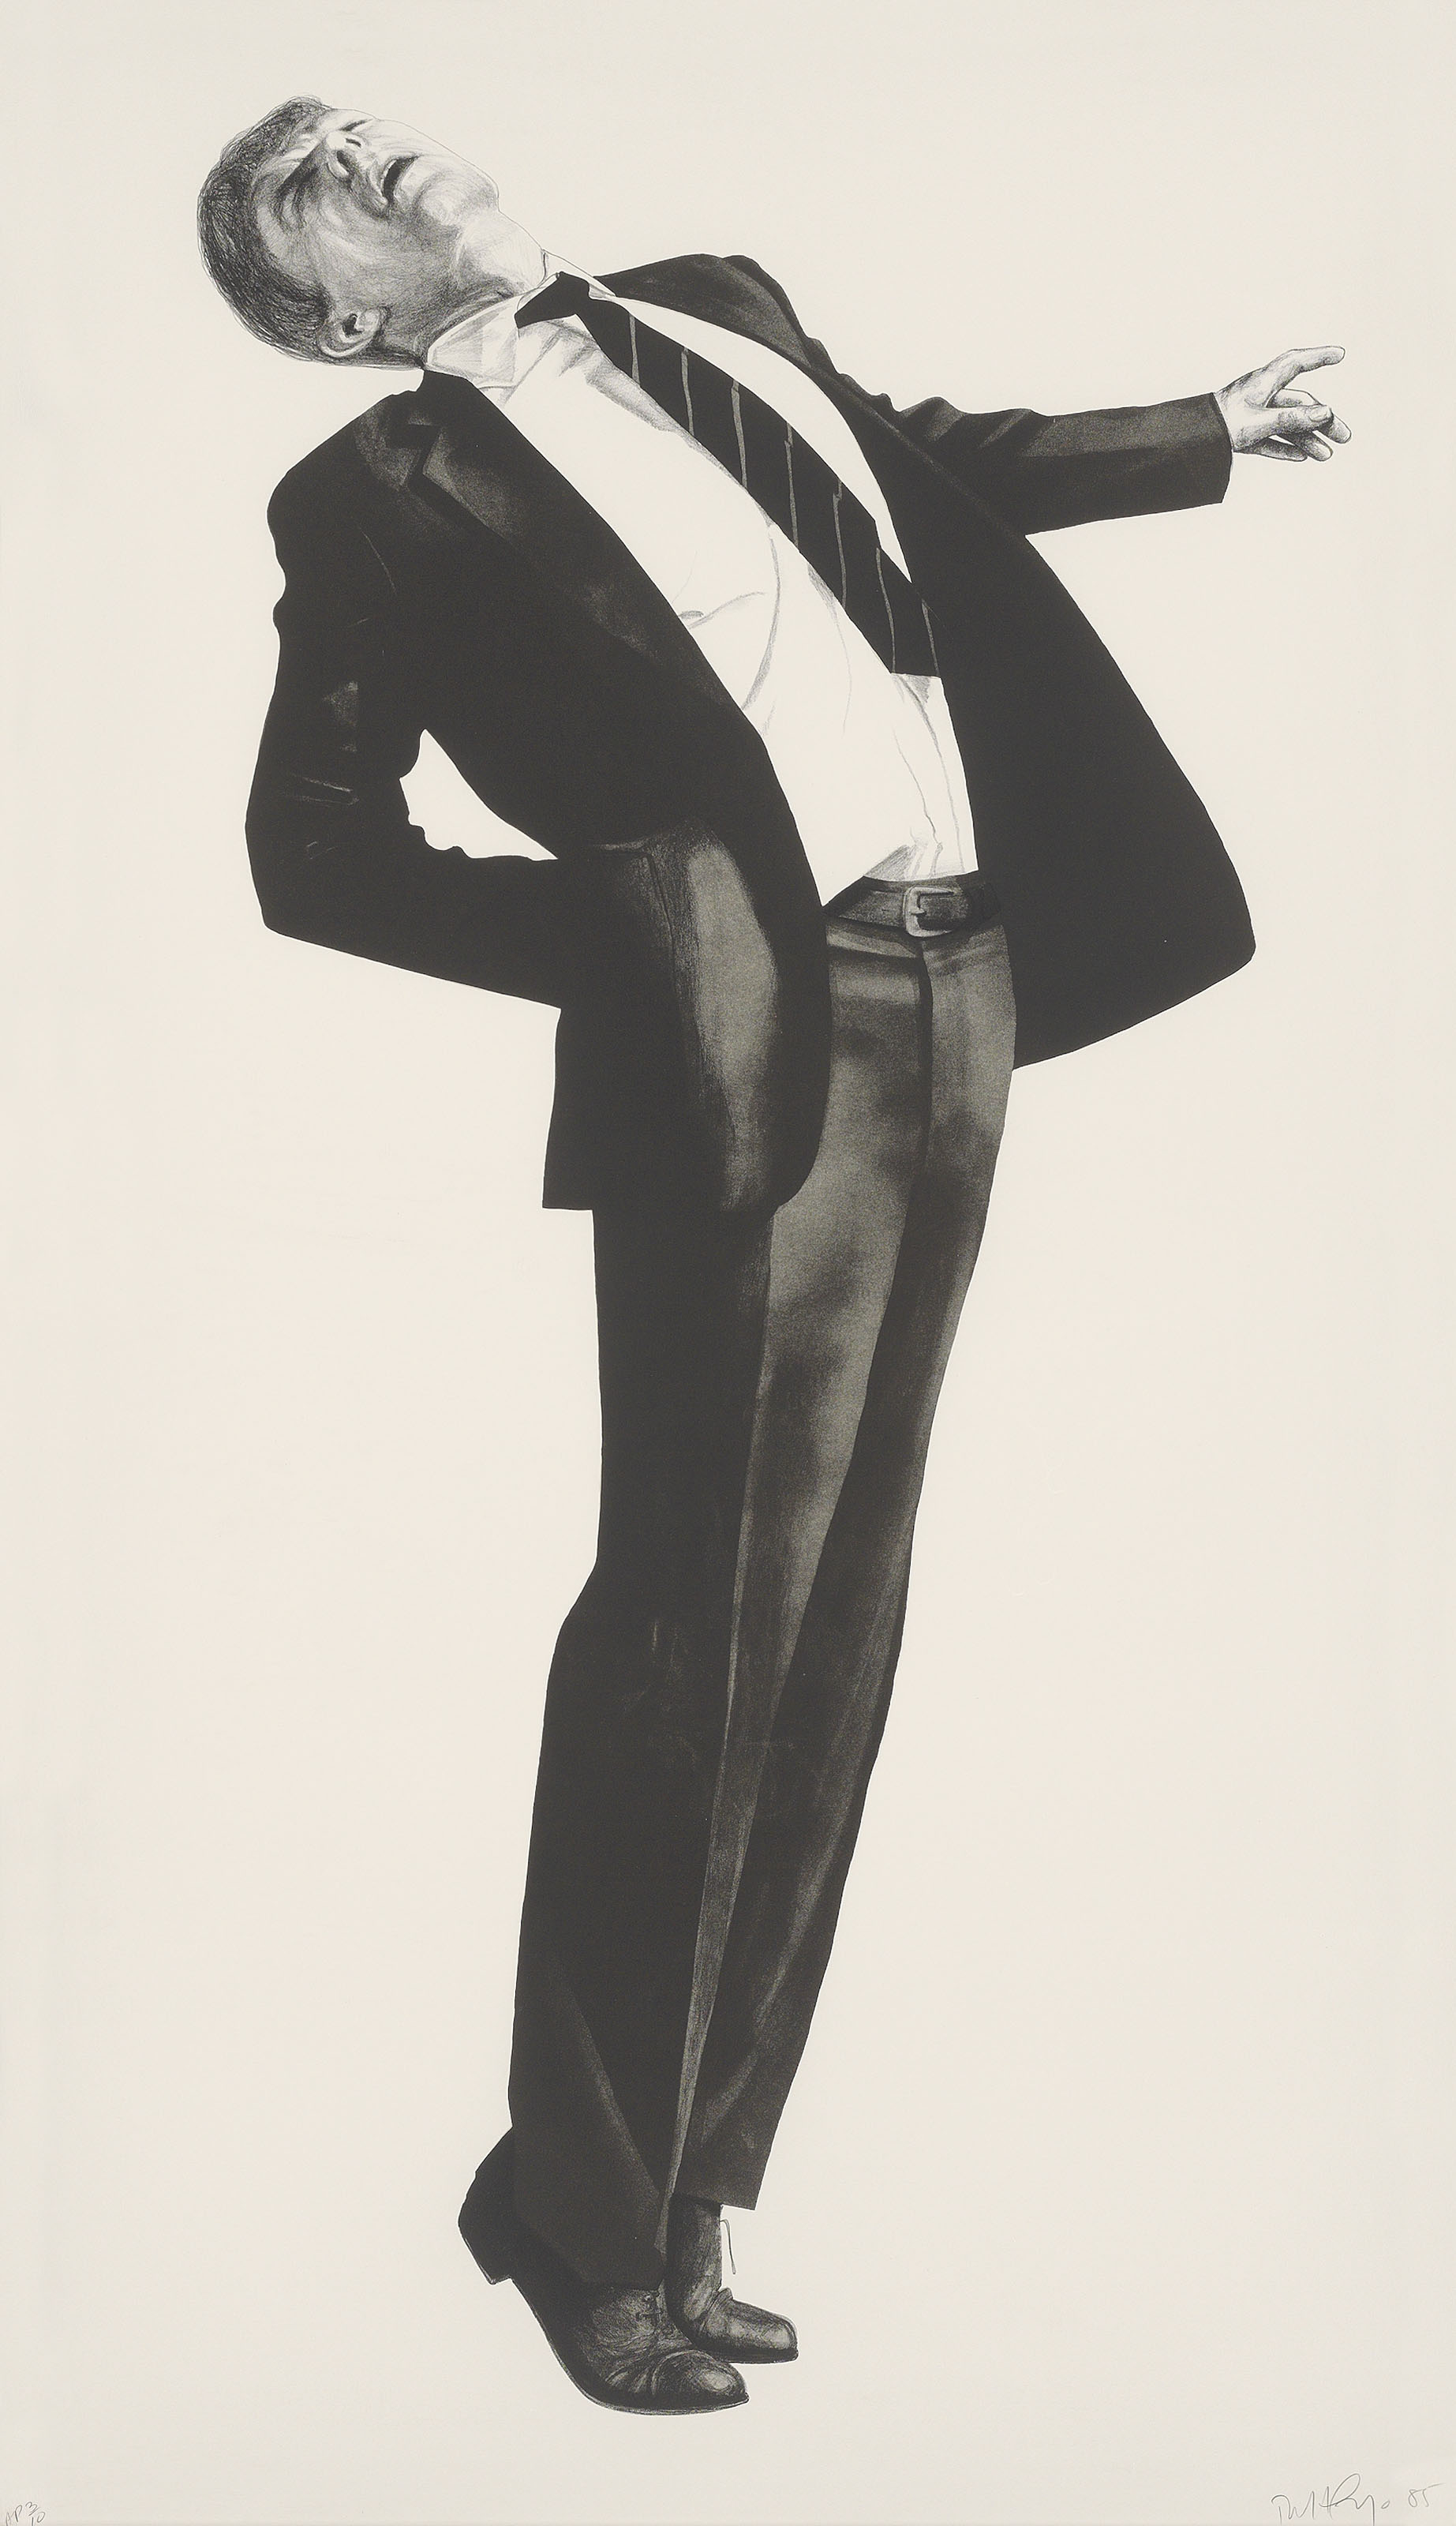 ROBERT LONGO (B. 1953)